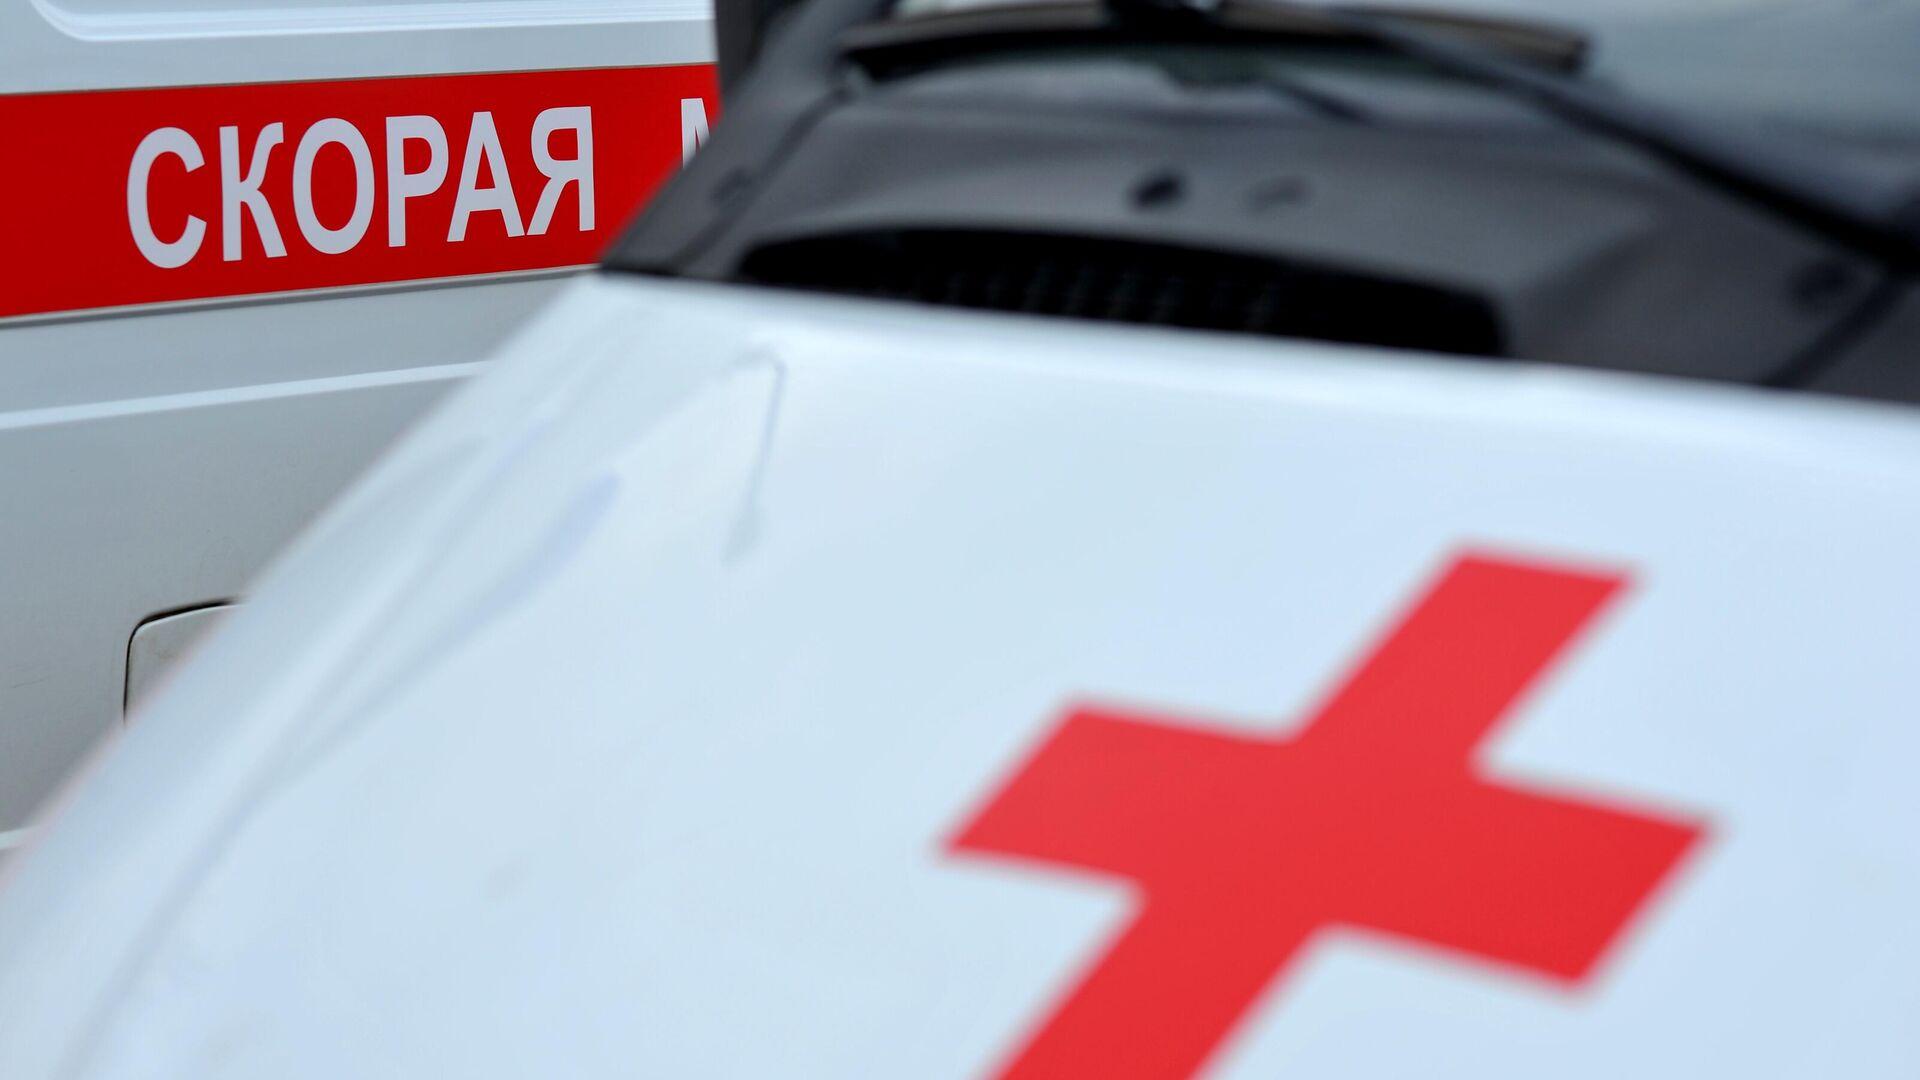 В Тюмени проверят отчет об оказании медицинской помощи мертвецу